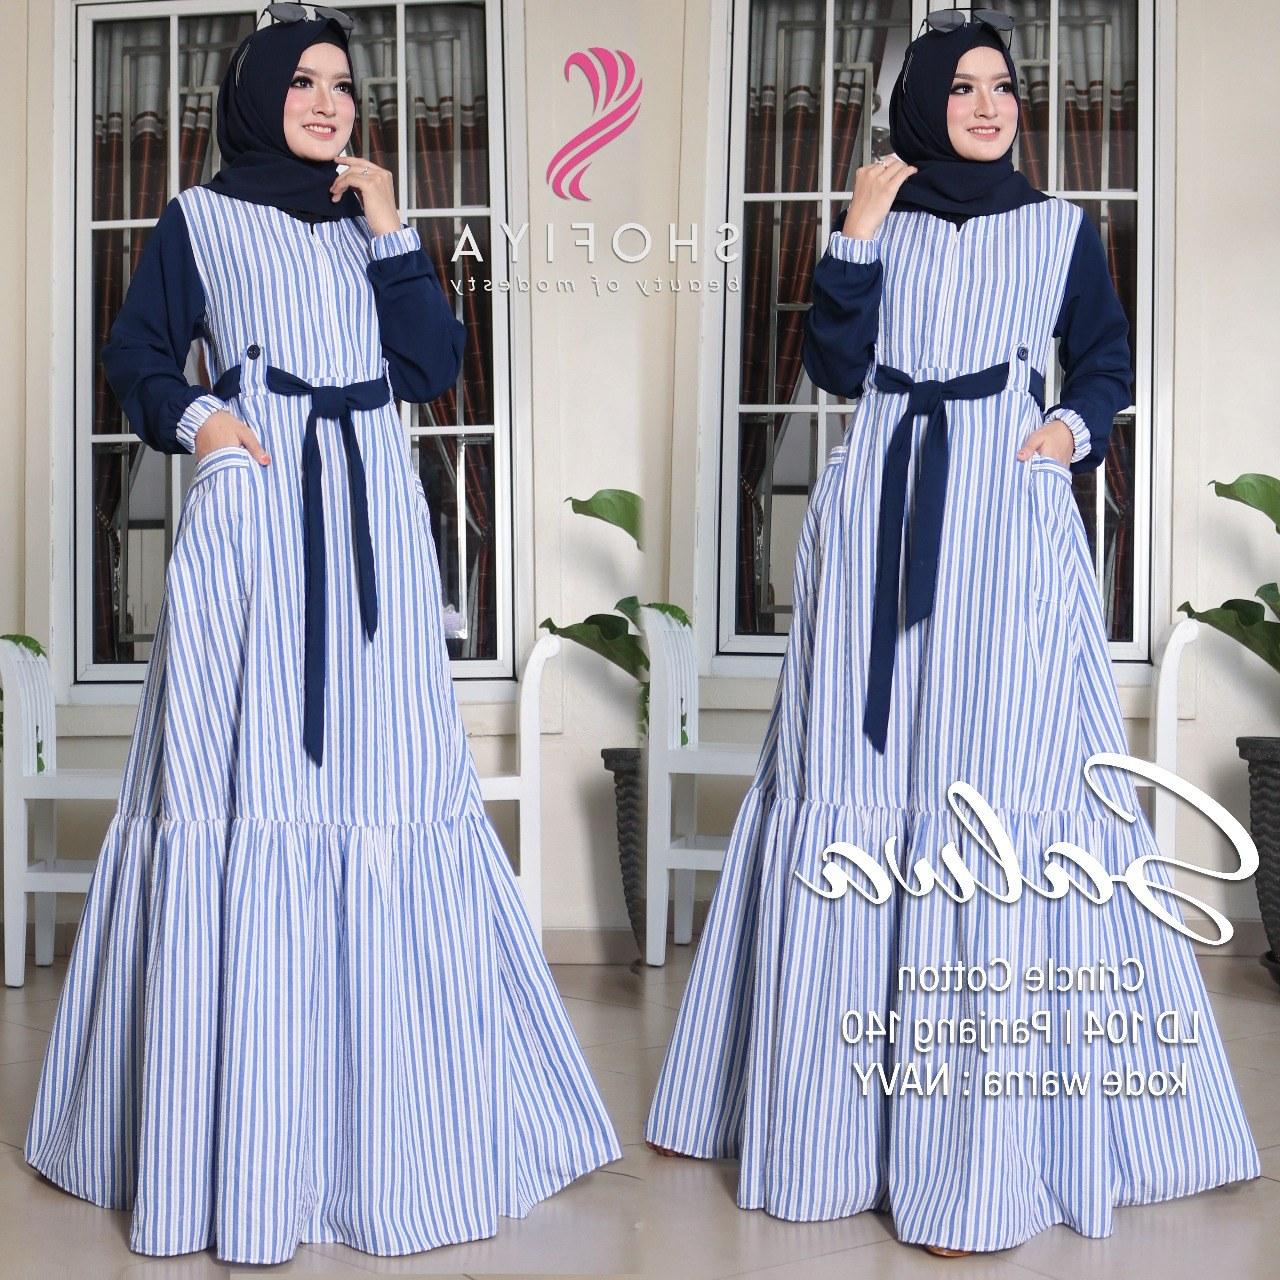 Design Koleksi Baju Lebaran Terbaru Wddj Model Baju Lebaran Terbaru Untuk Remaja Gambar islami